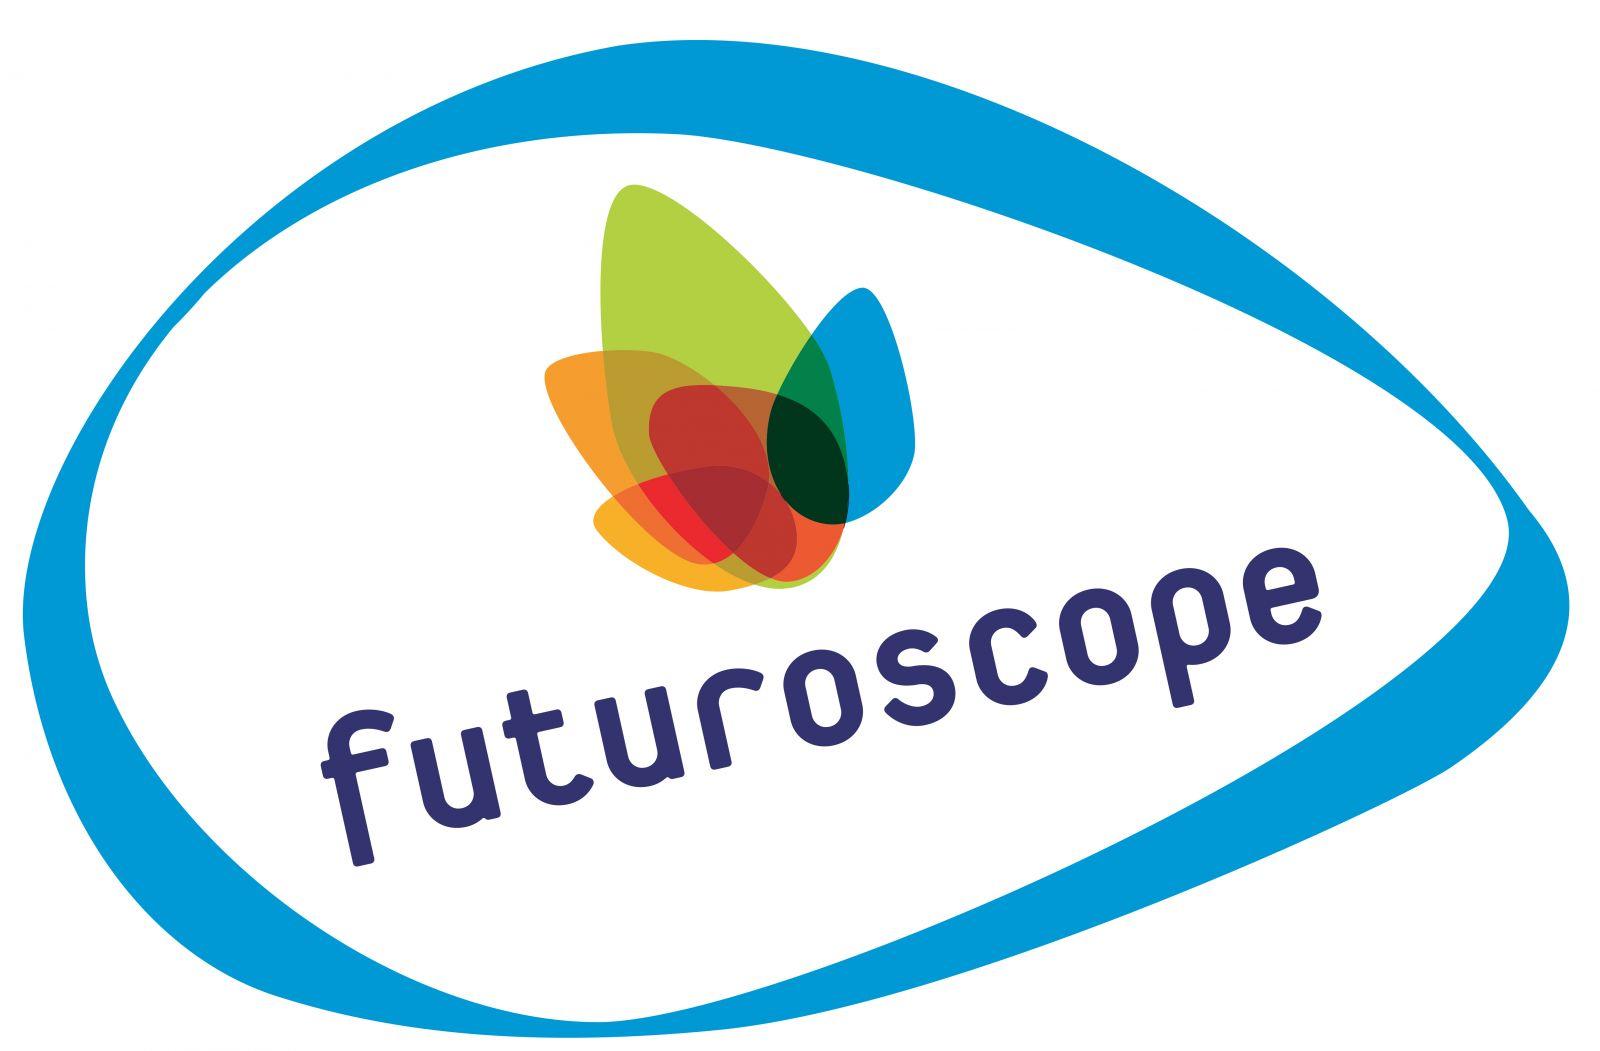 E-billet automatique 1 Jour FUTUROSCOPE - Adulte